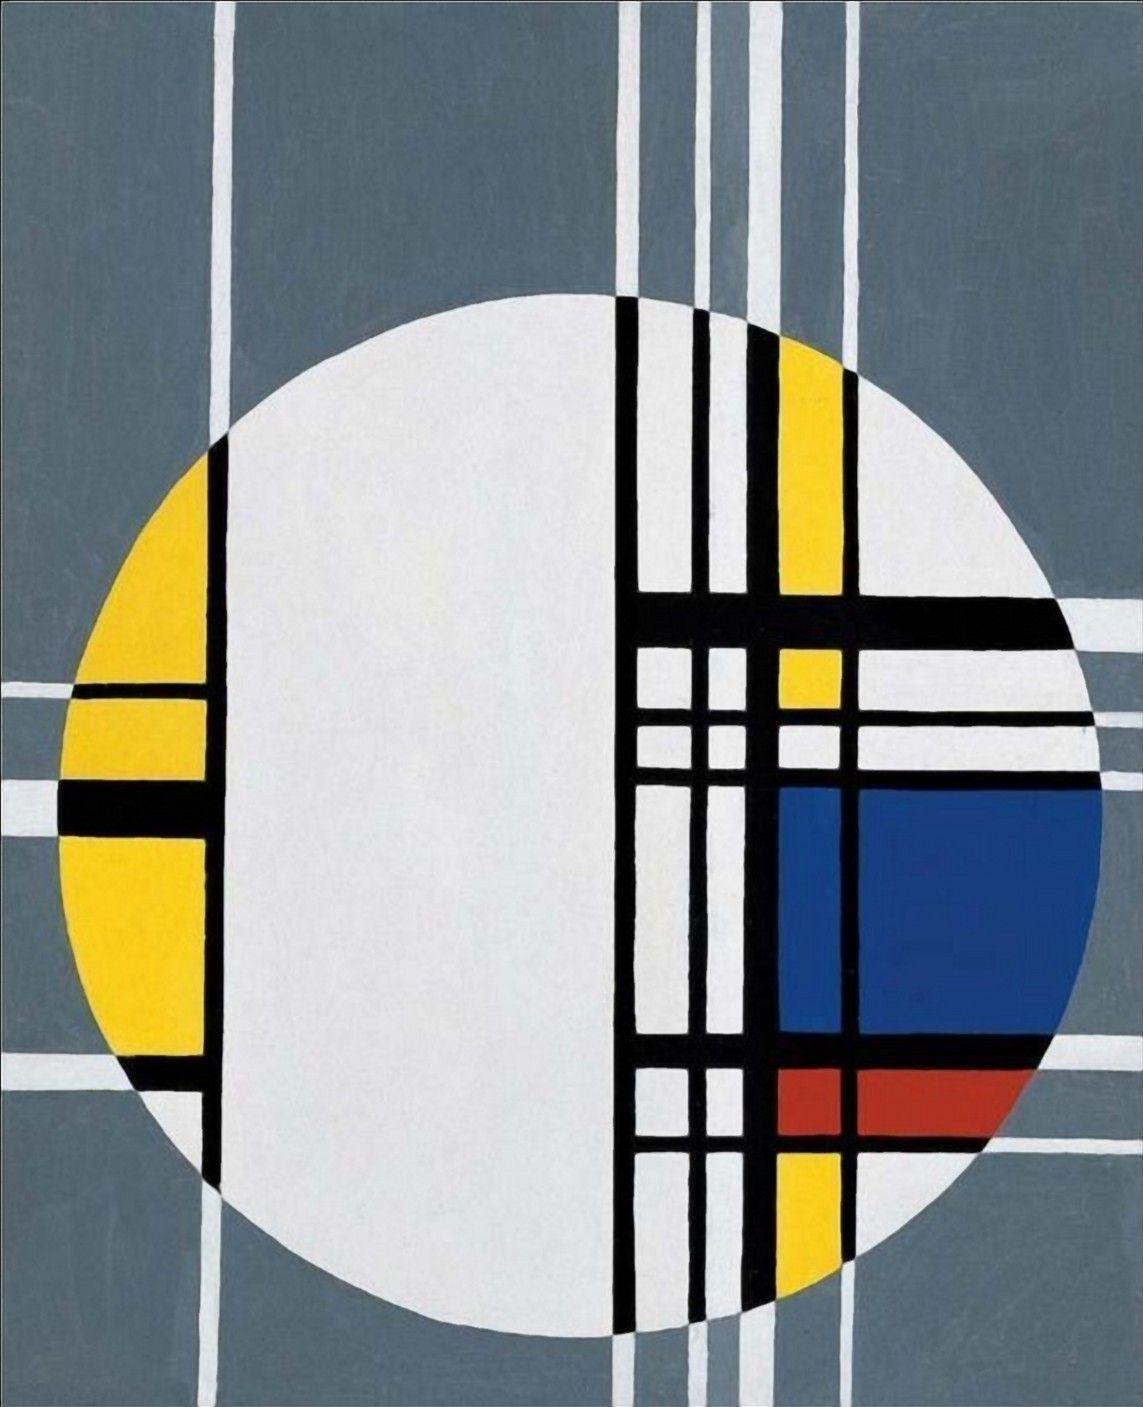 Jean Albert Gorin (1899 - 1981) Composition N17 1961 (66 x ... Оп Арт Живопись